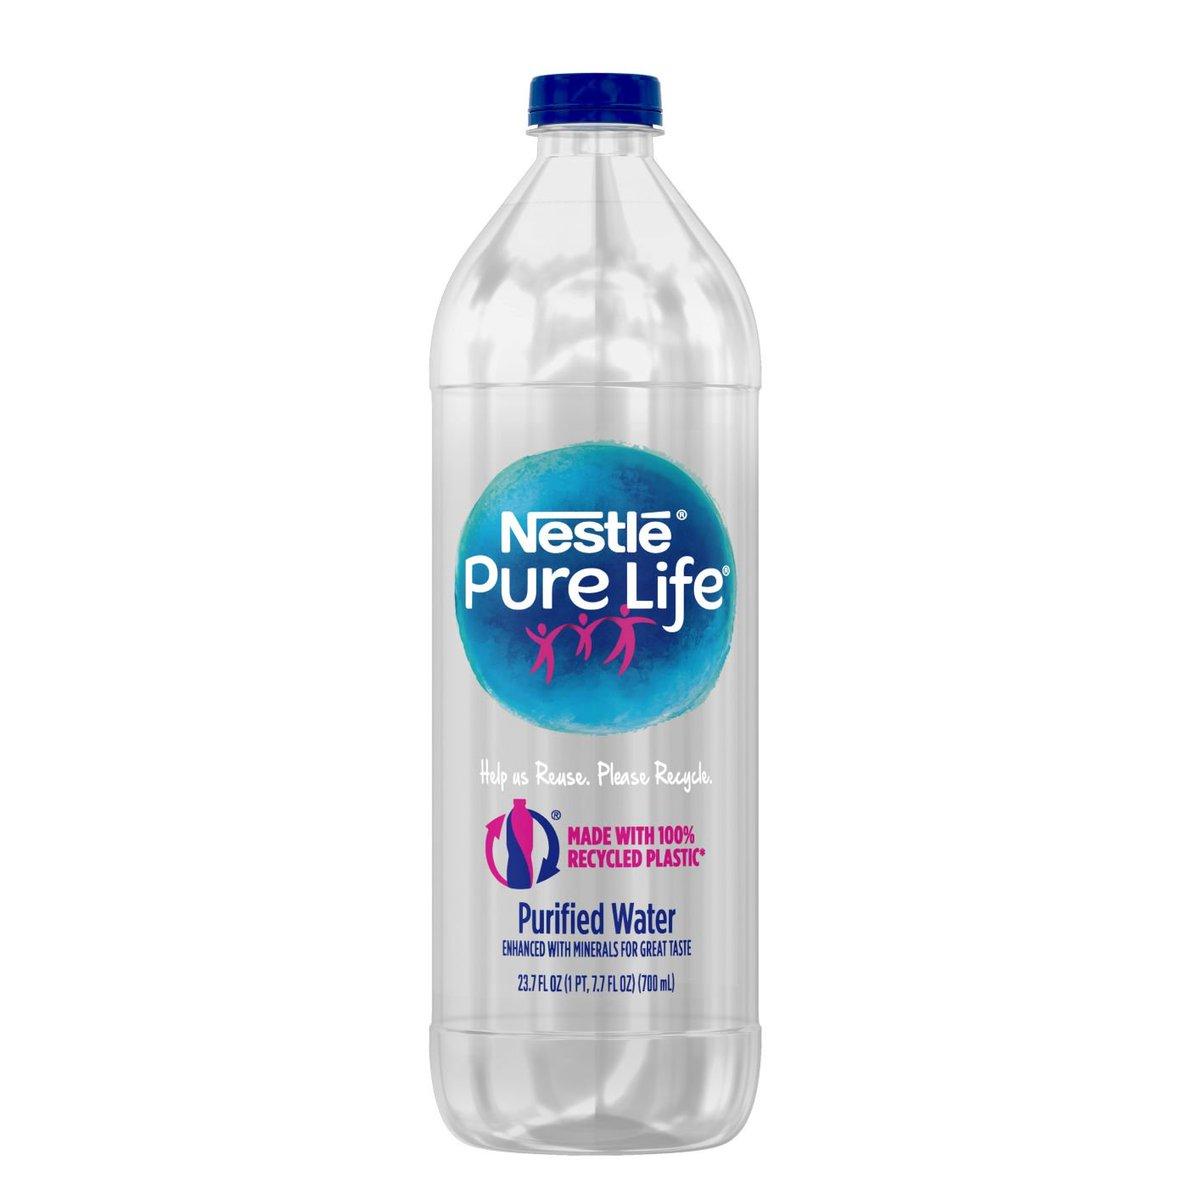 Nestlé Pure Life (@NestlePureLife) | Twitter